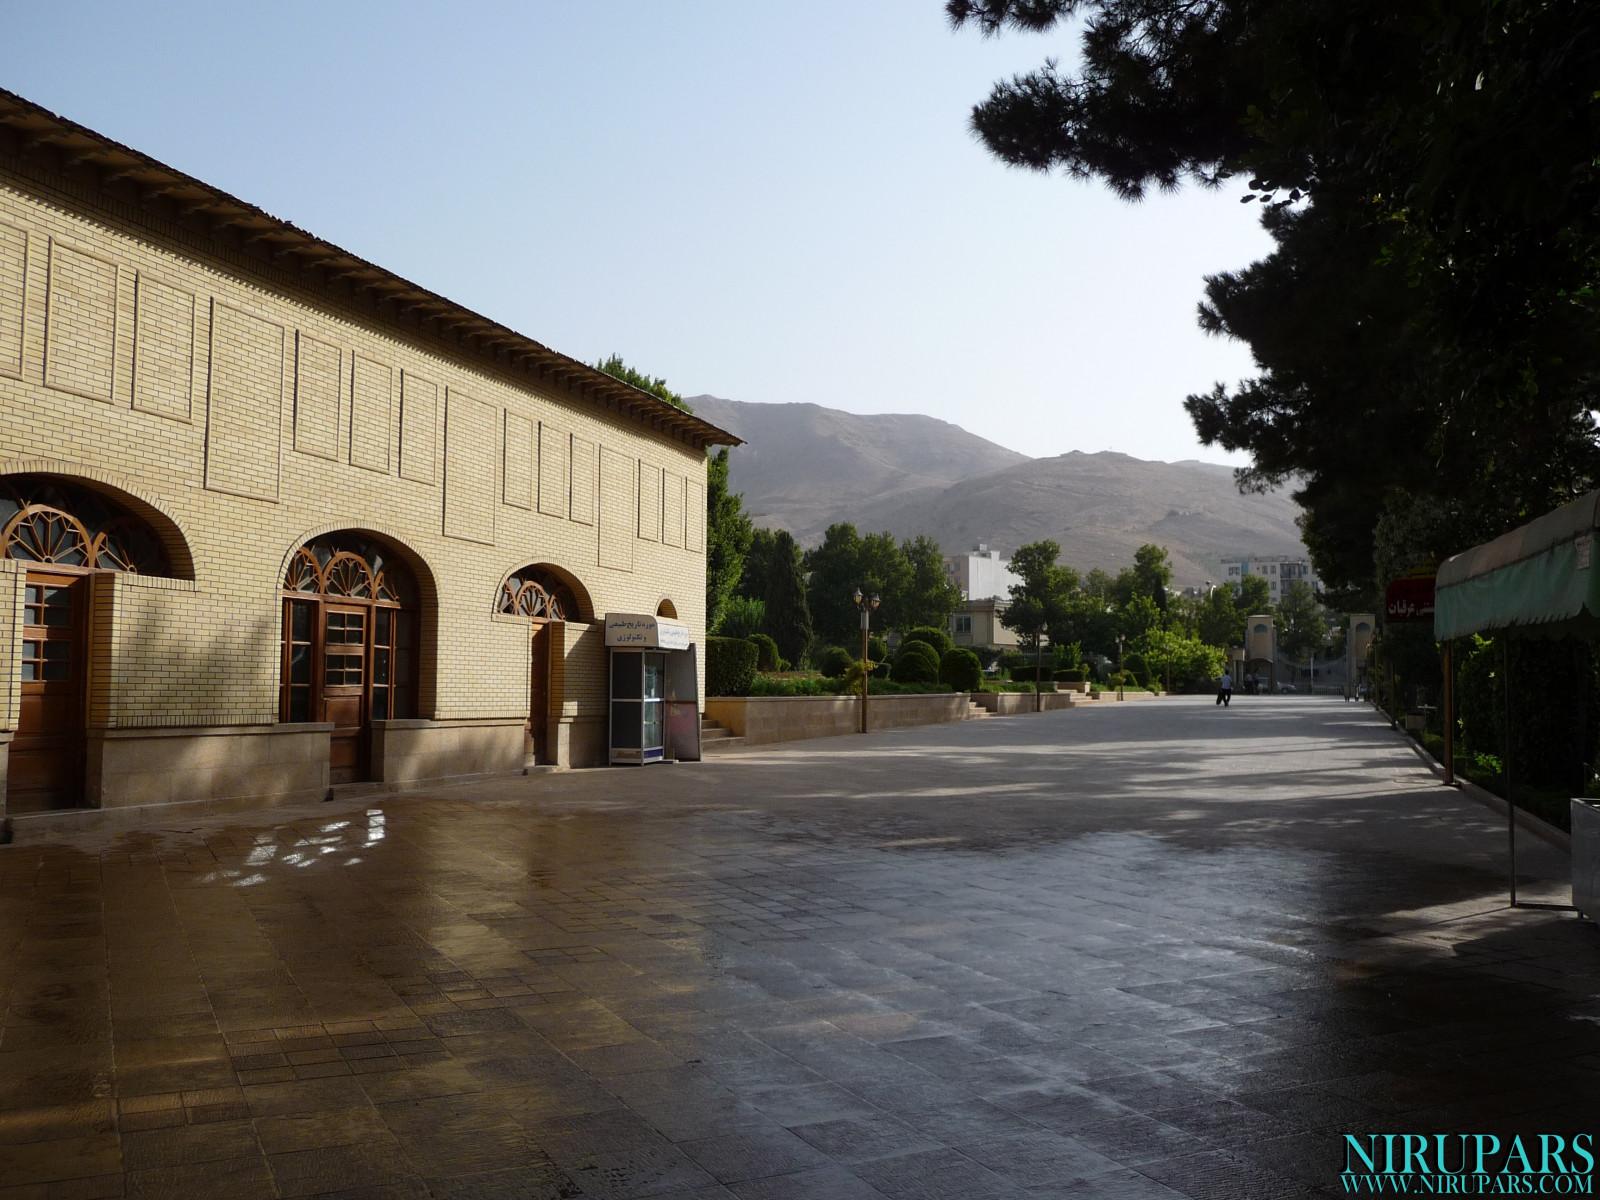 Baq-e Eram - Entrance - Teehouse